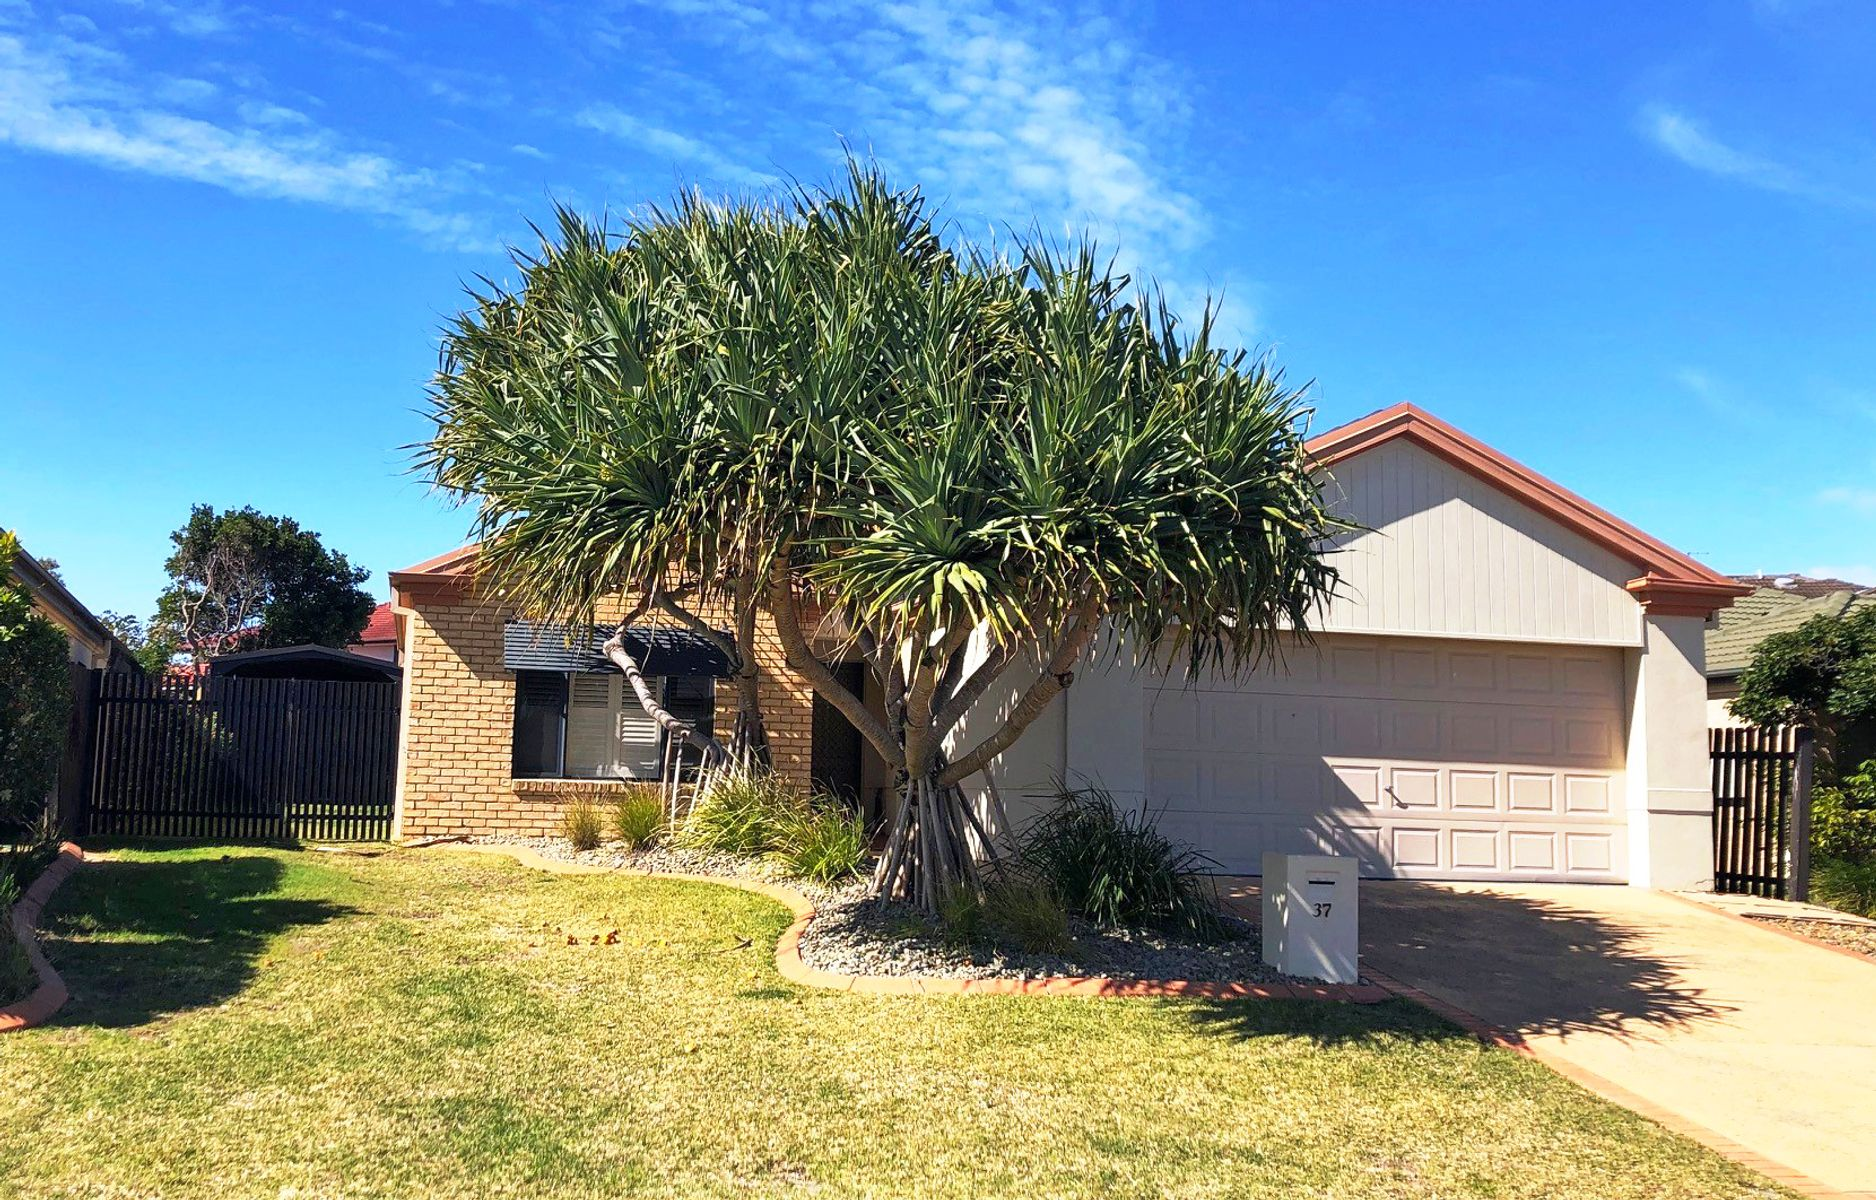 37 Oceania Court, Yamba, NSW 2464